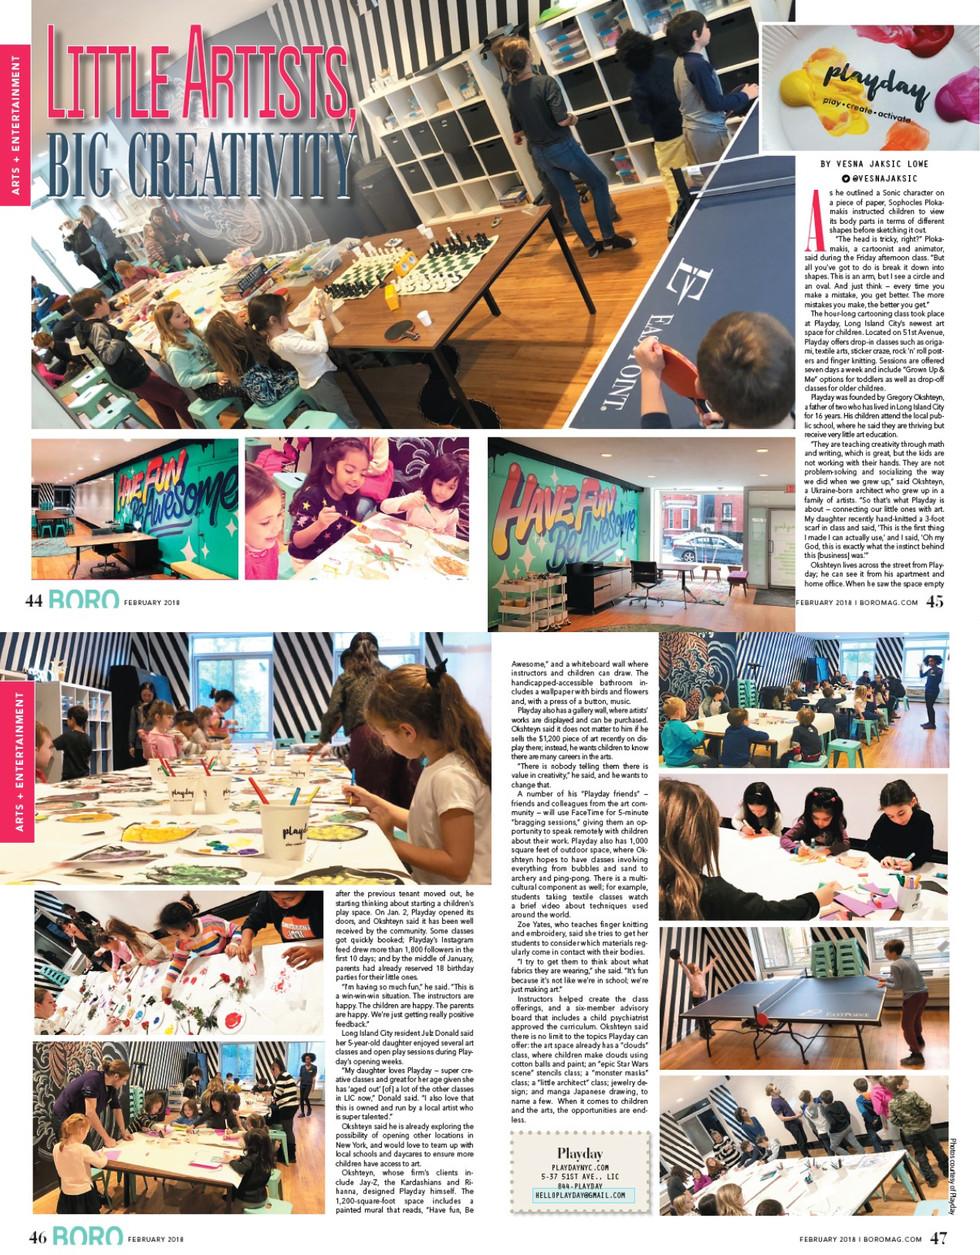 LITTLE ARTISTS BIG CREATIVITY BORO MAGAZINE FEBRAURY 2018